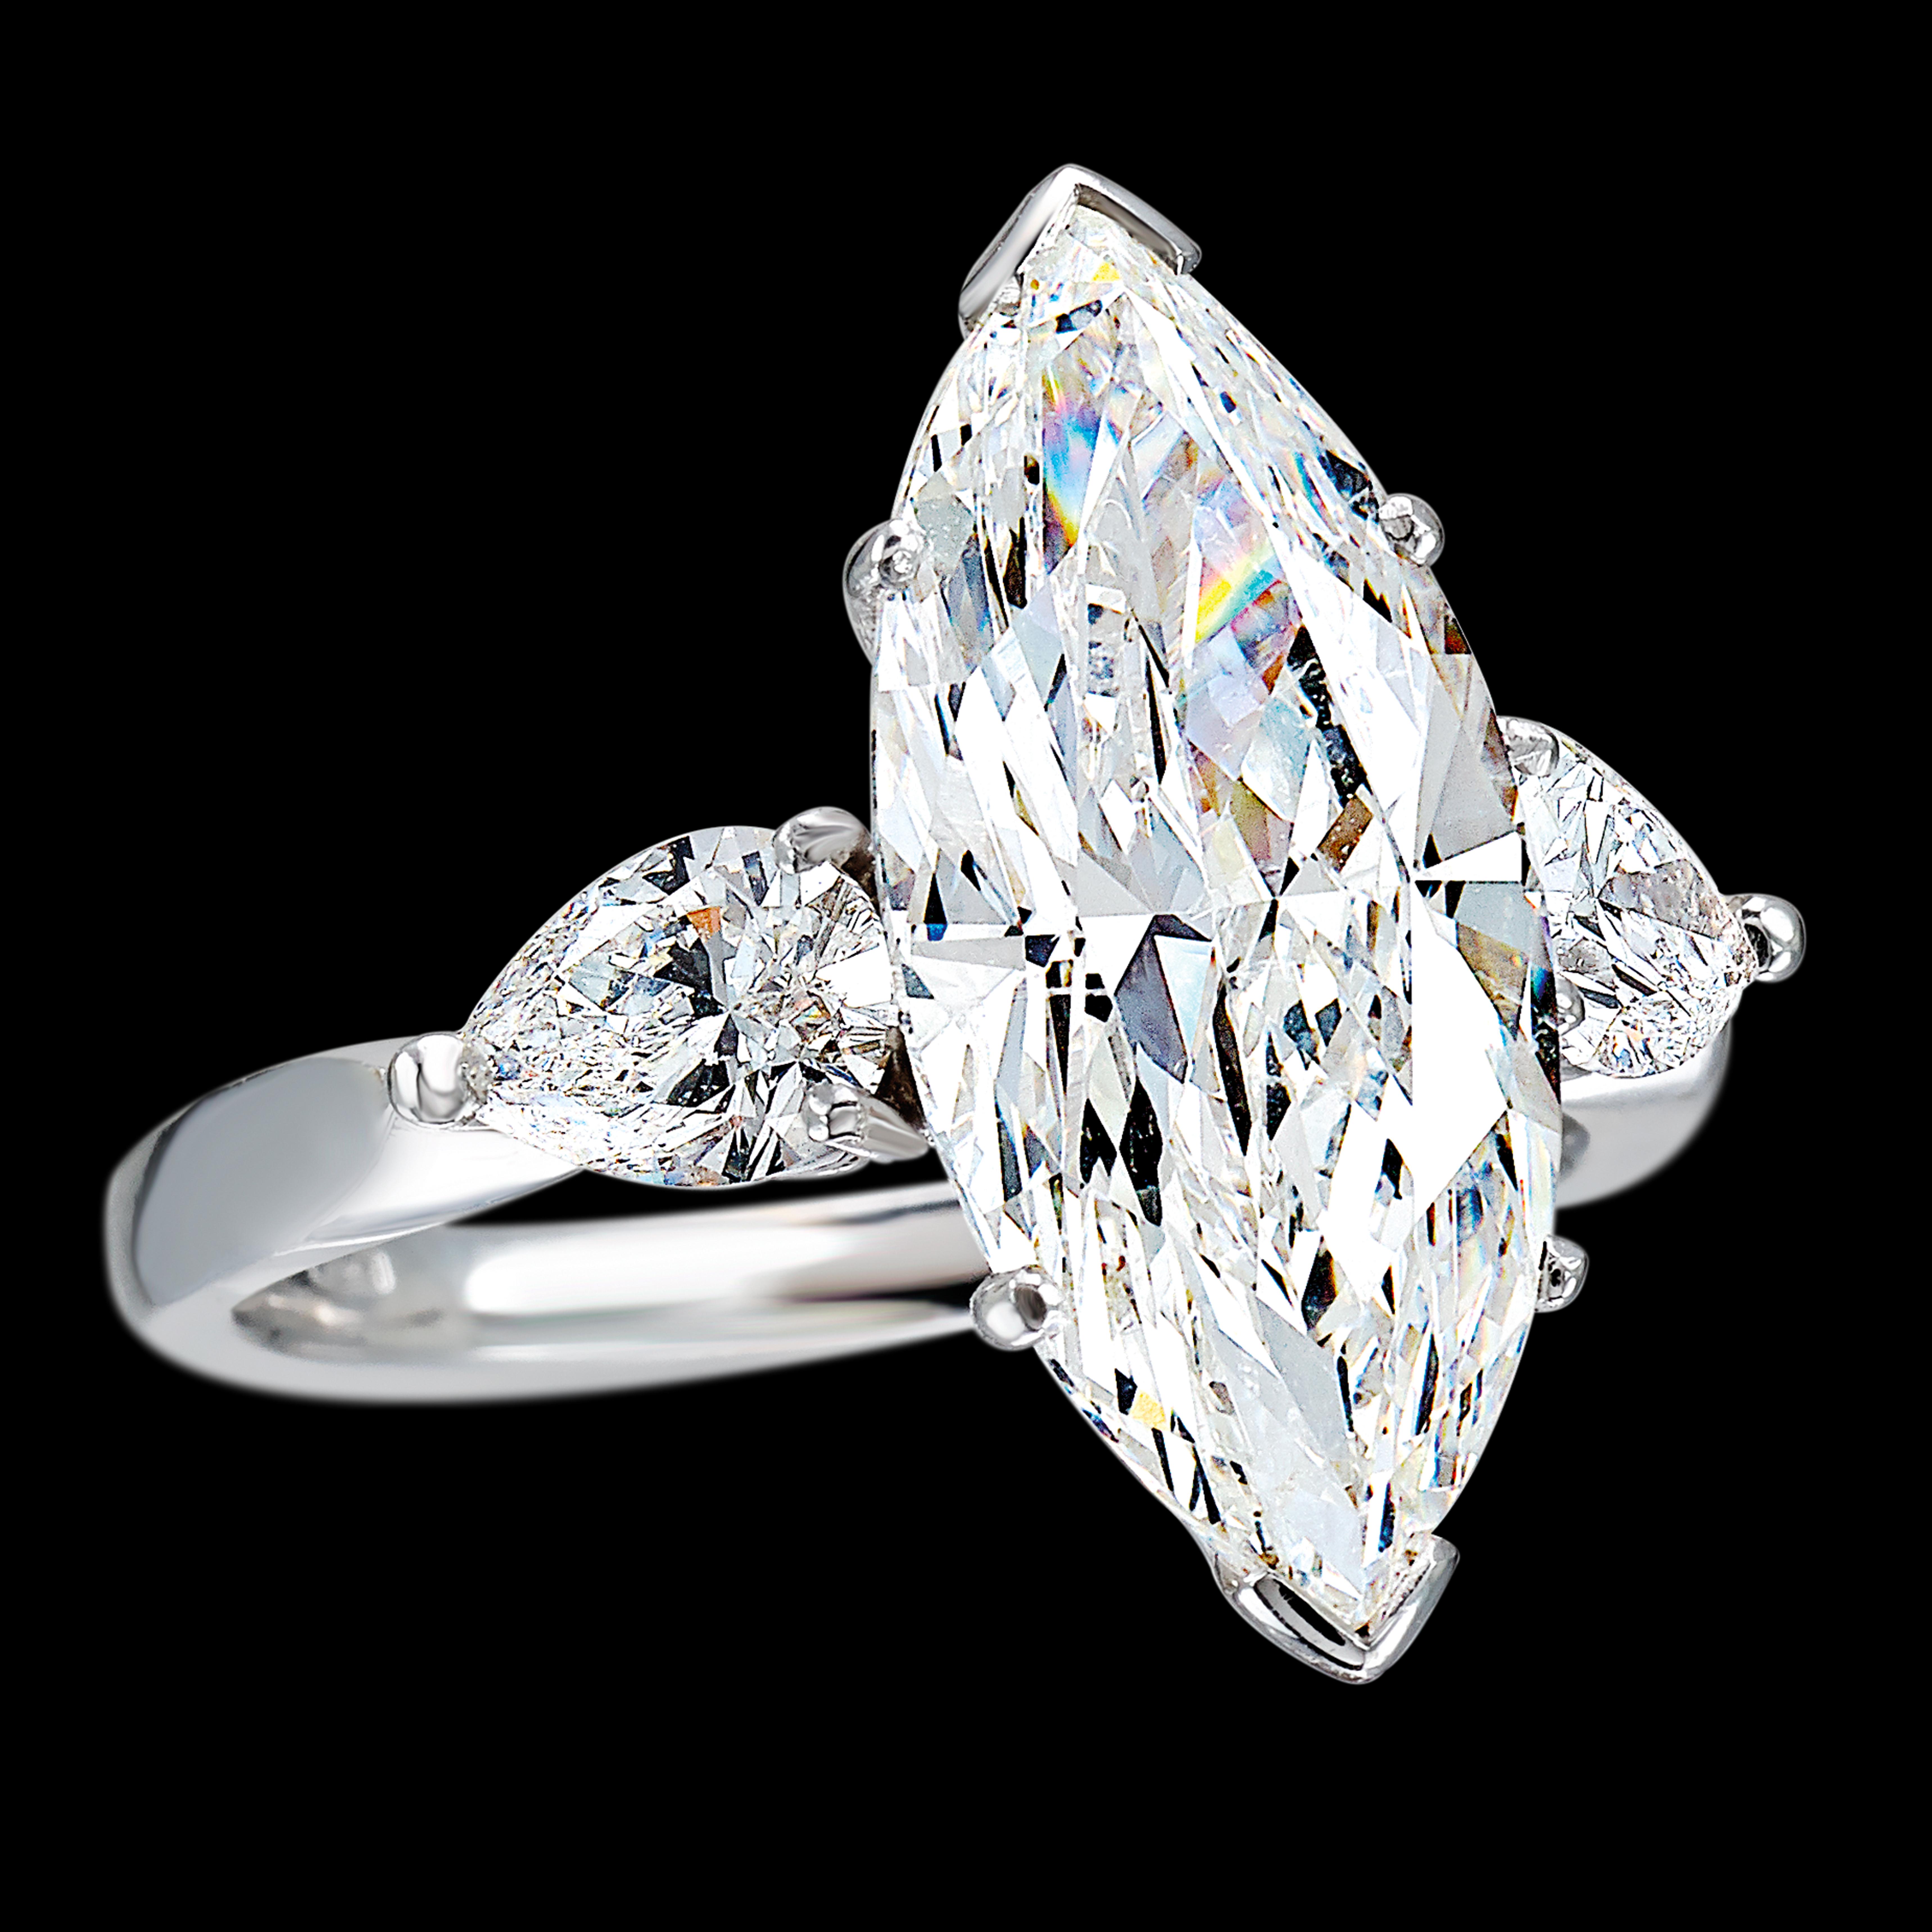 massimo raiteri marquise diamond solitair solitario marquise anello diamanti diamonds classic timeless